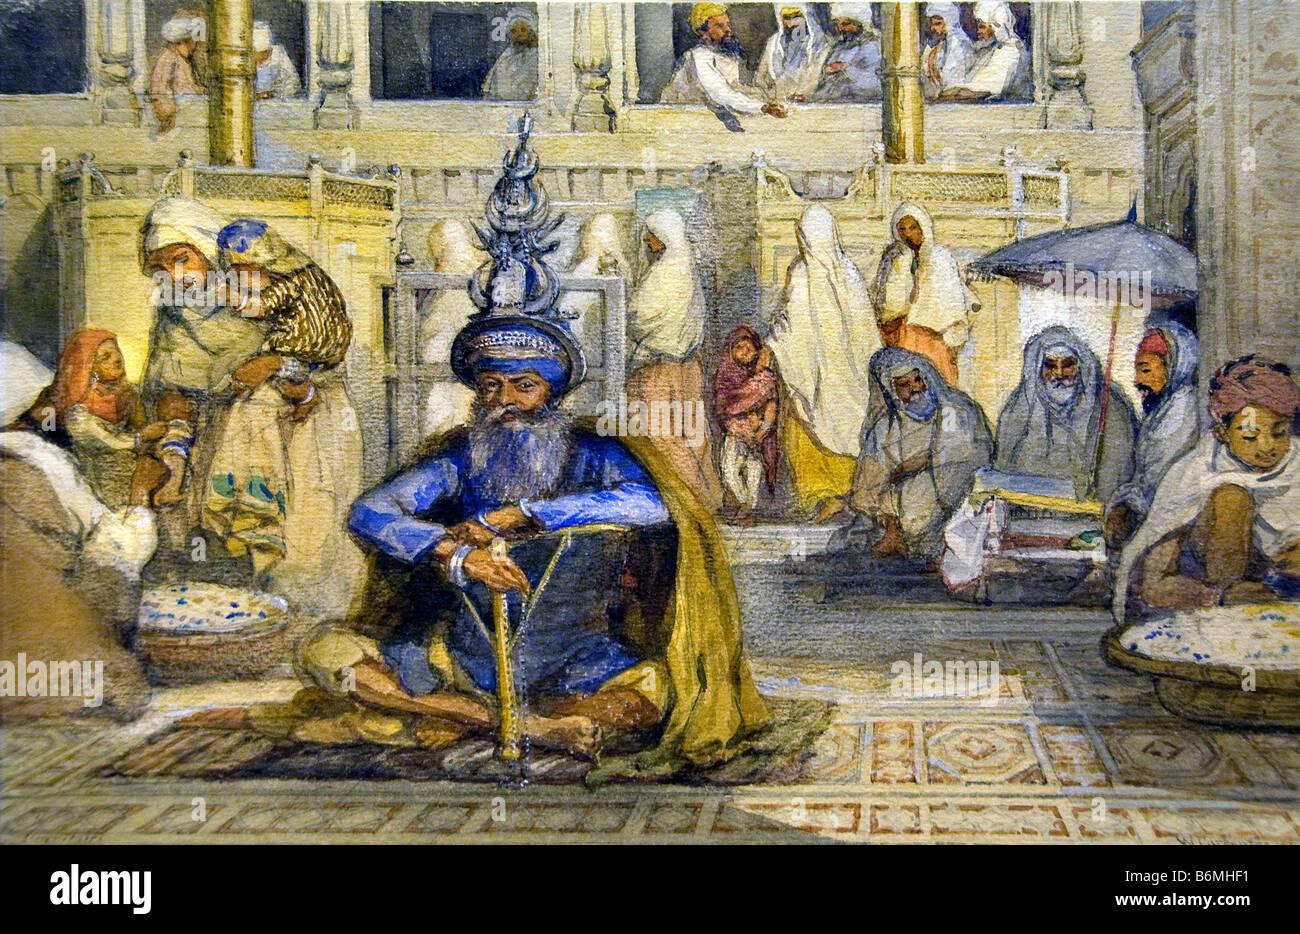 Wizard Bazaar civilians  egypt egyptian  museum - Stock Image